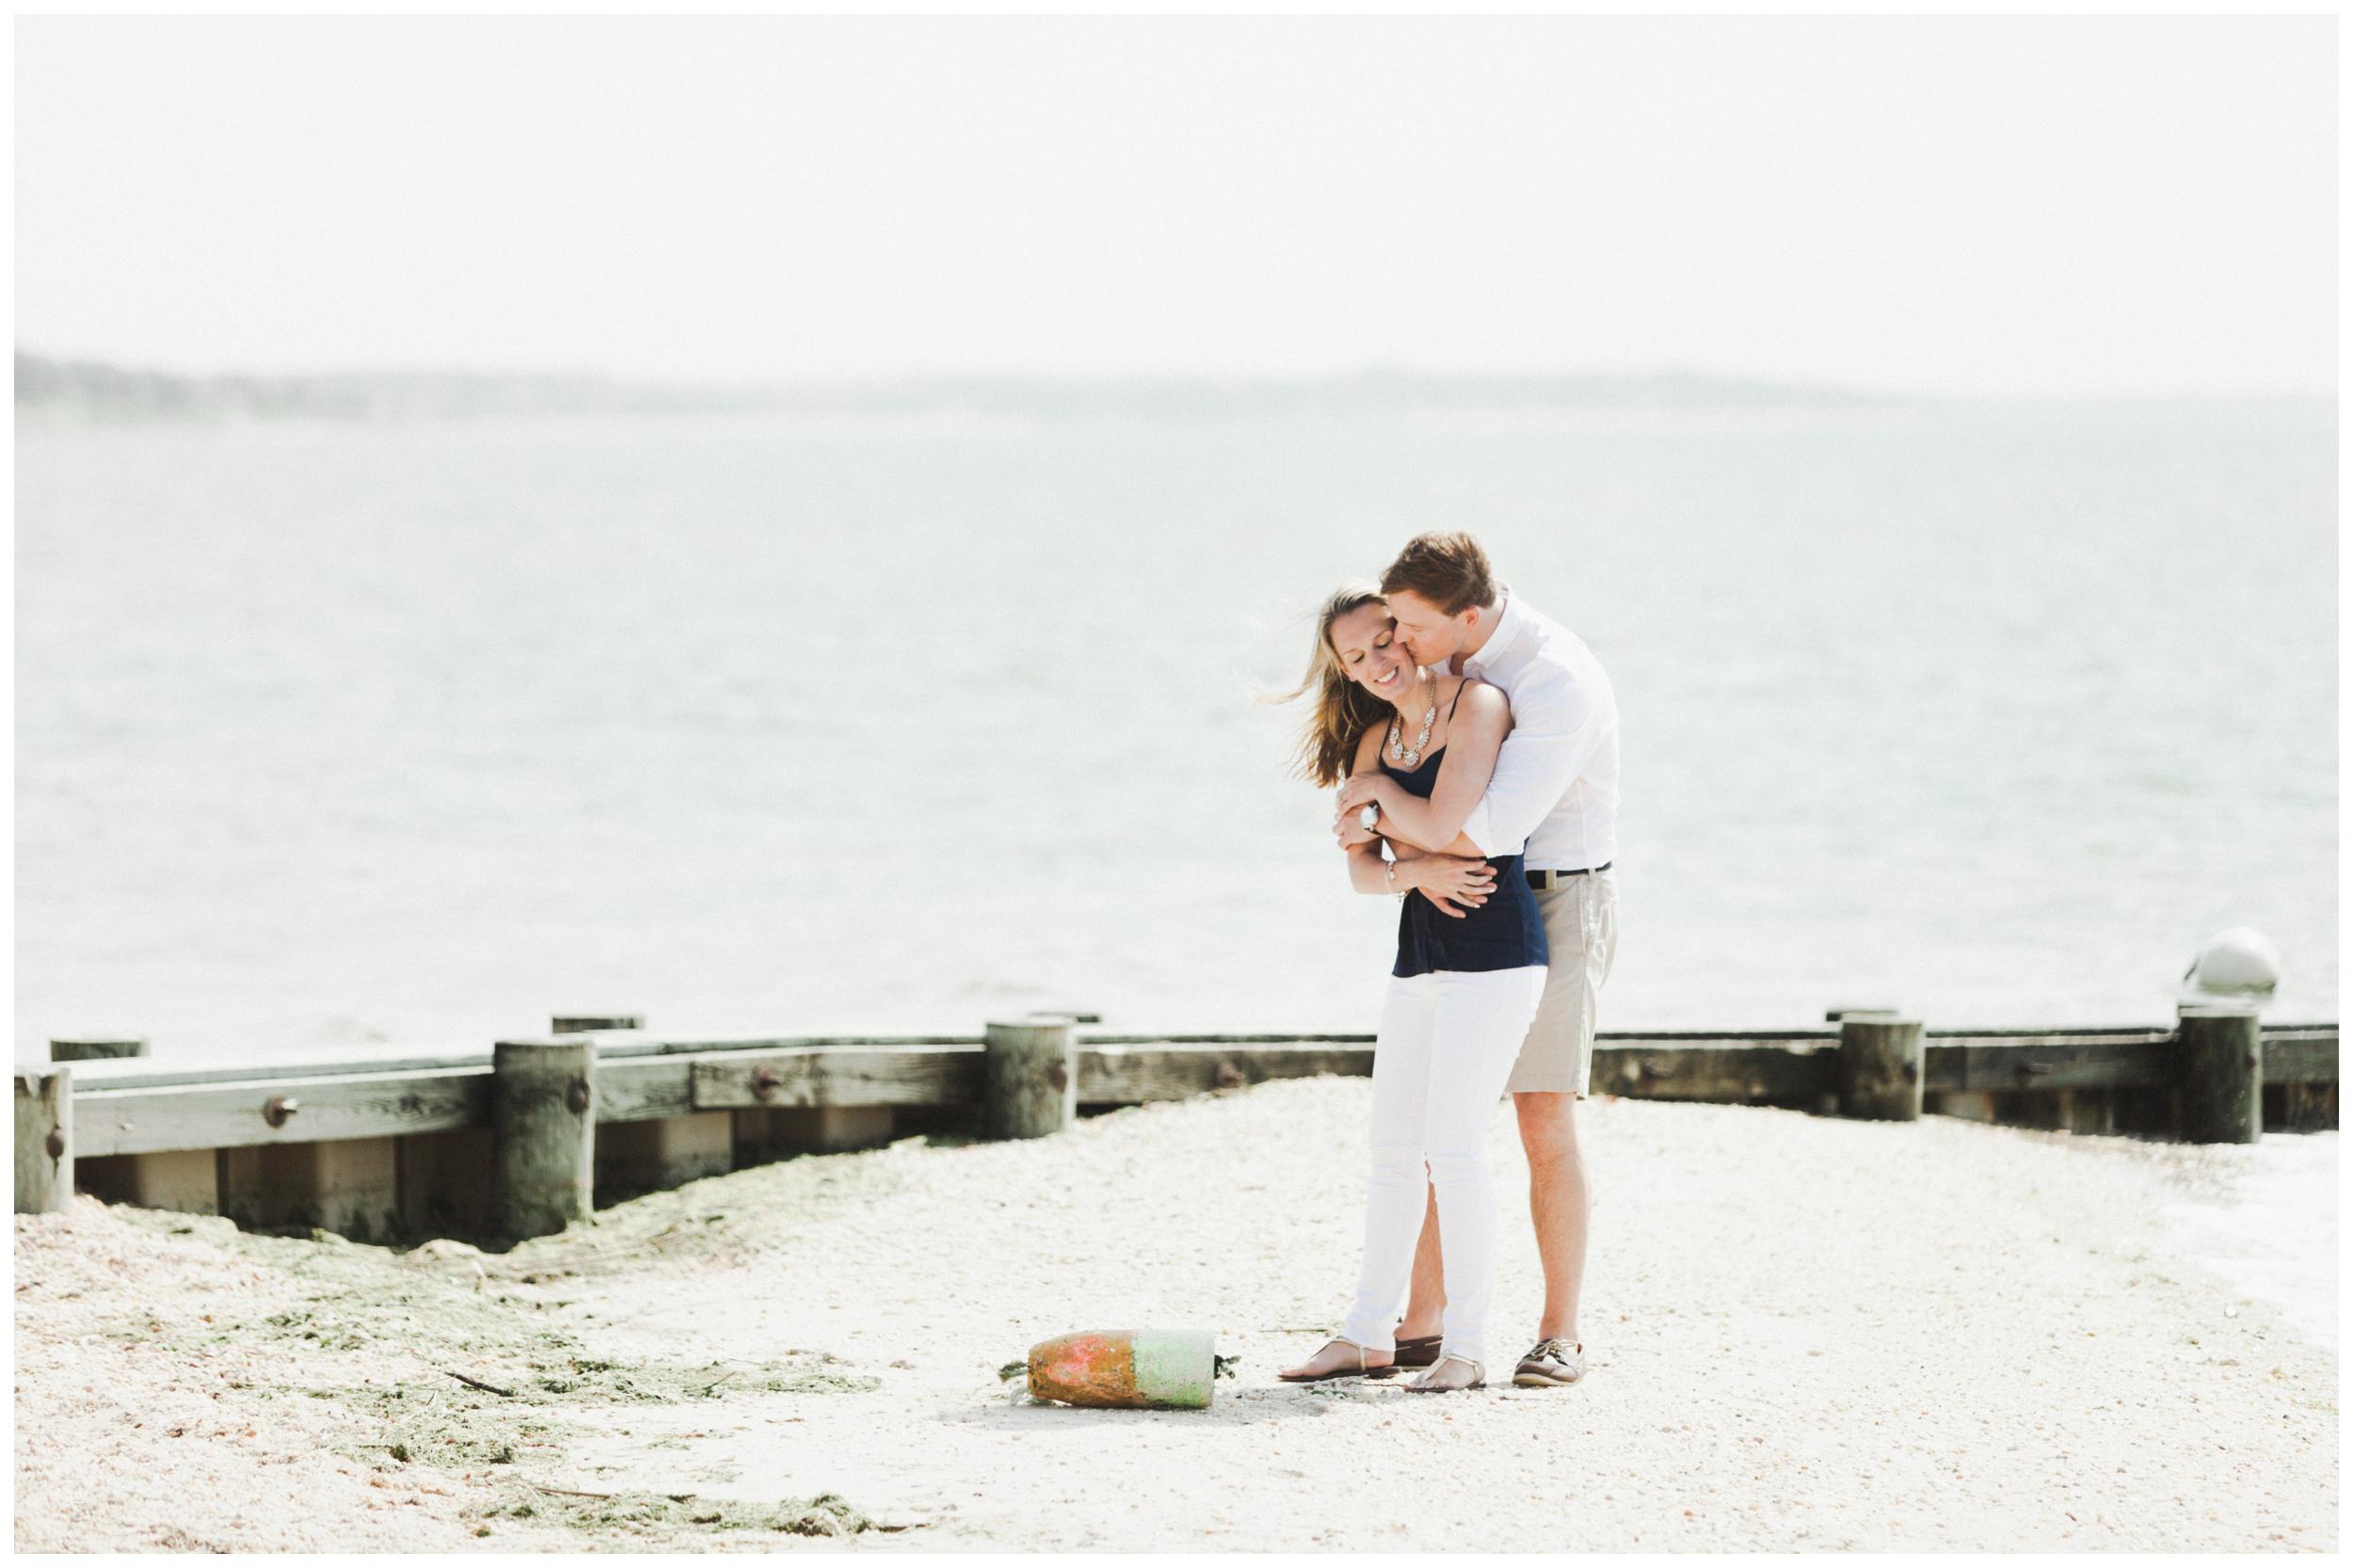 10-North-Fork-Beach-Engagement-Session-Allison-Sullivan.jpg